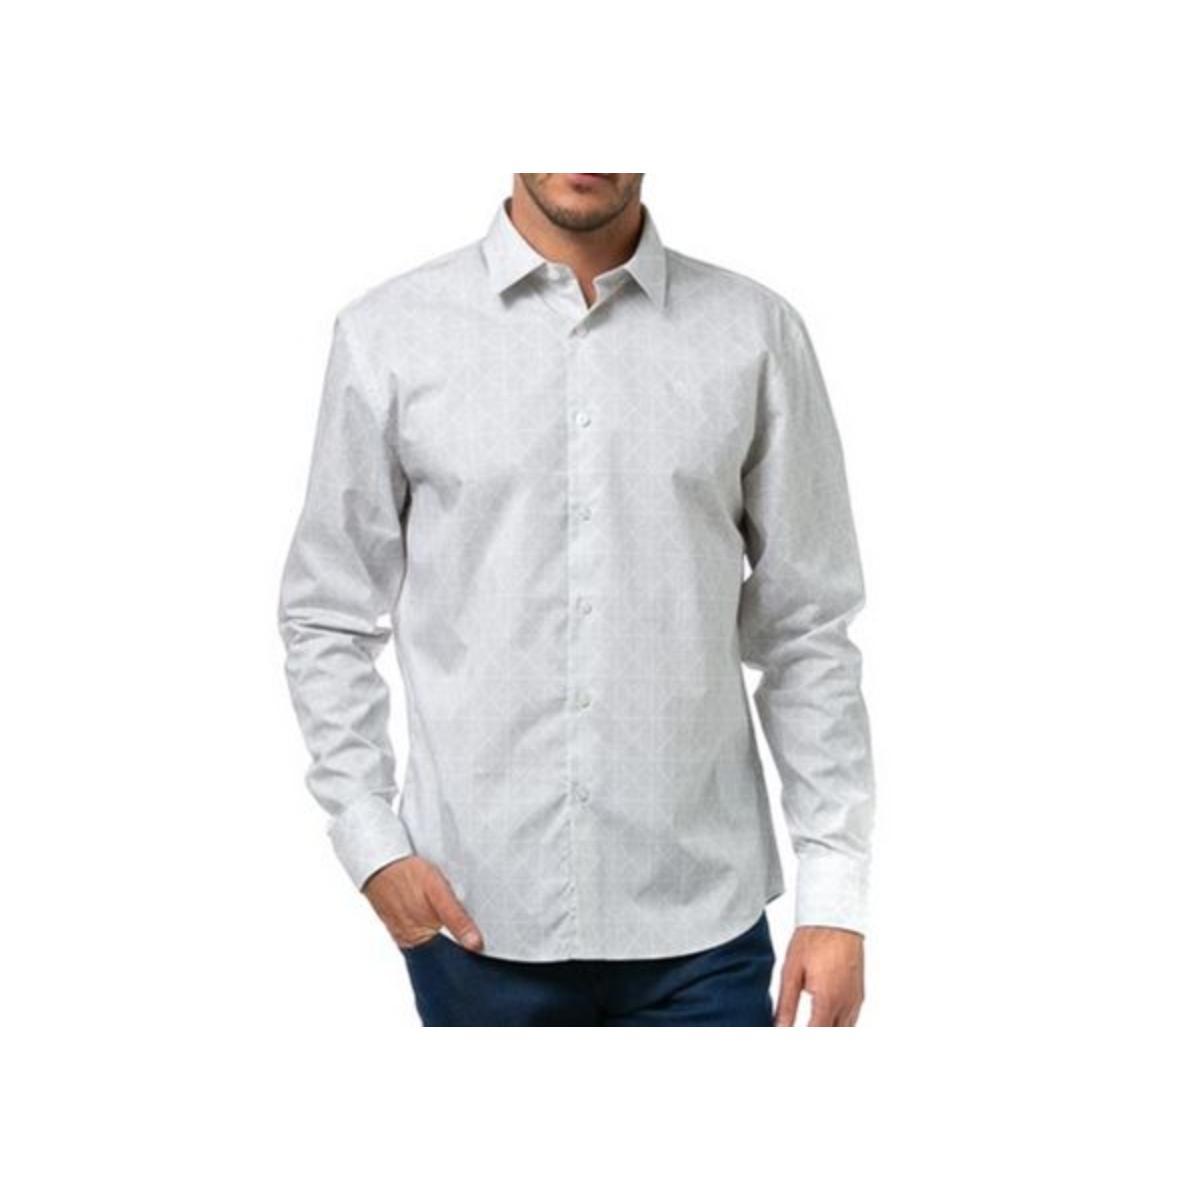 Camiseta Masculina Forum 314602954 Vf203  Off White/bege